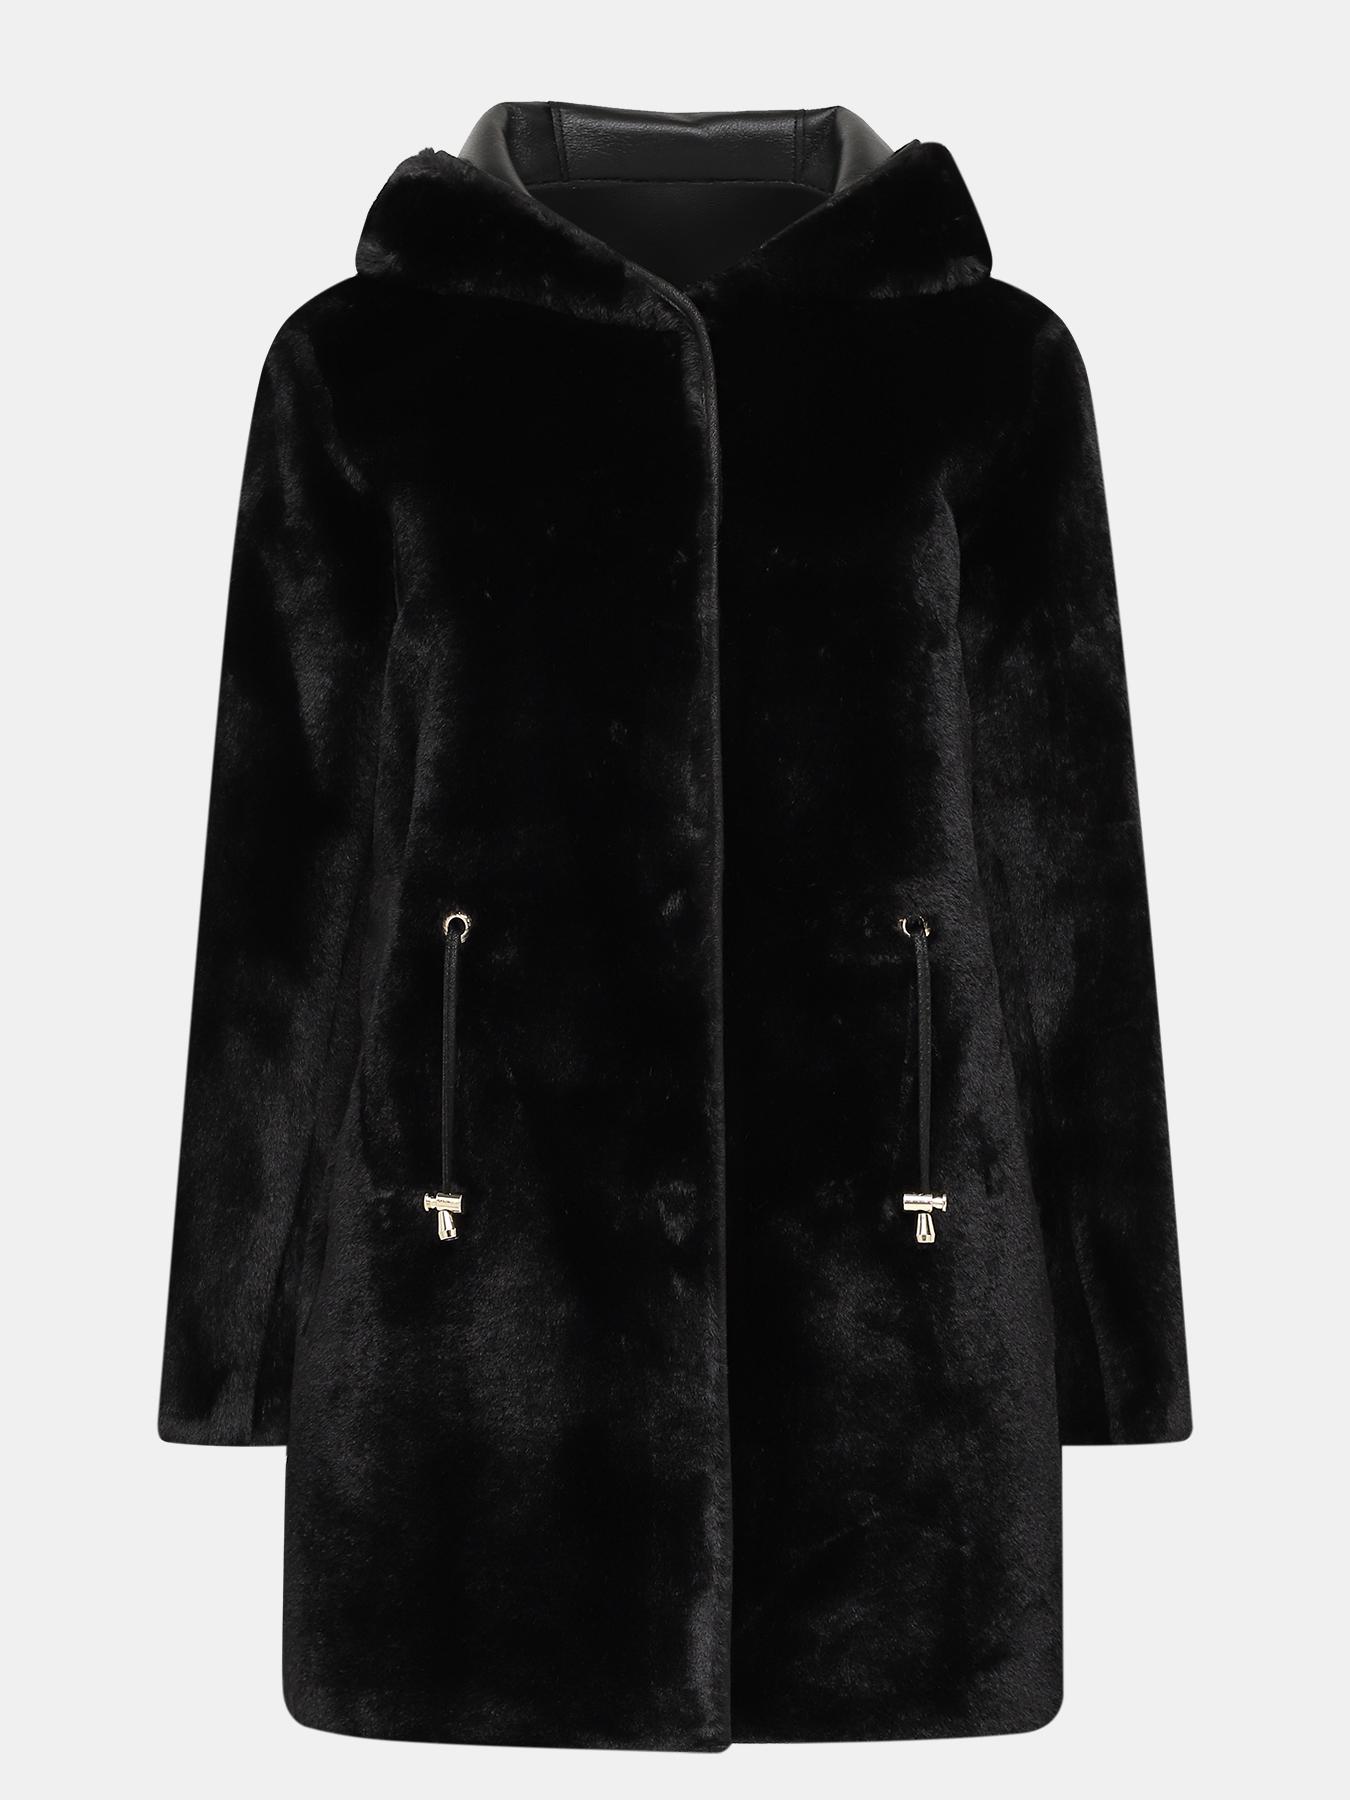 Пальто Emme Marella Двусторонее пальто Agile фото